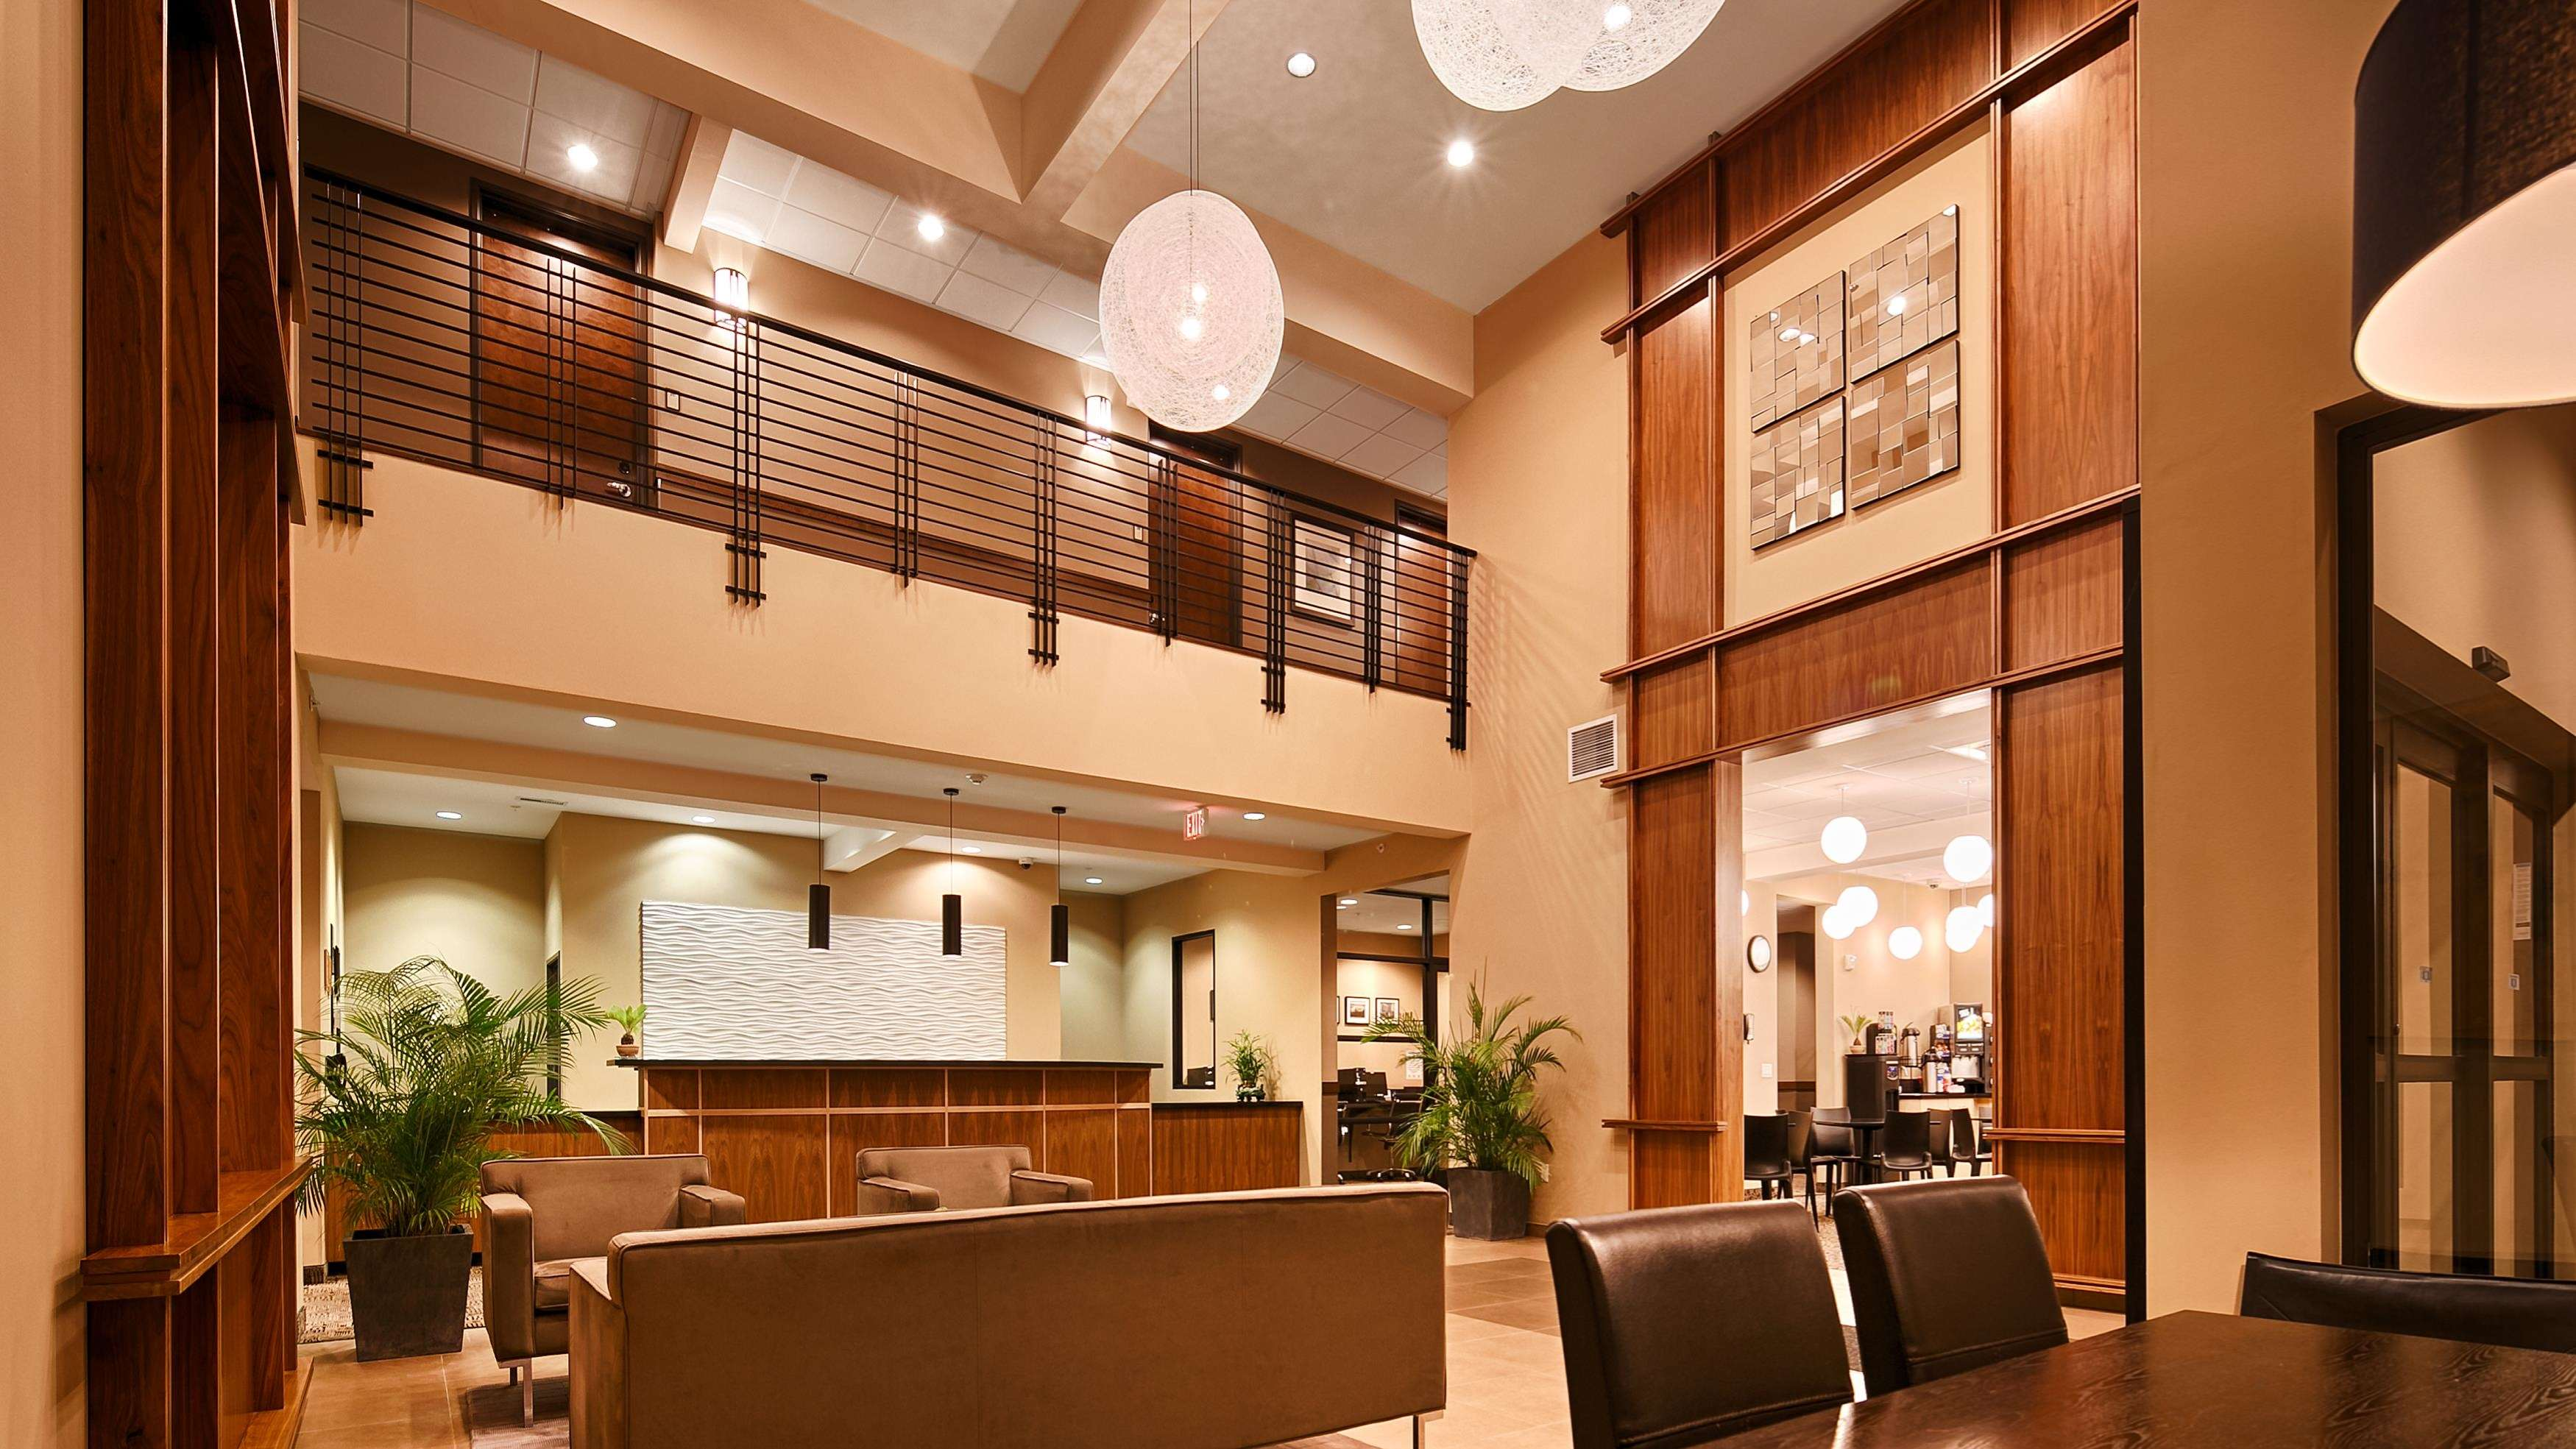 Best Western Plus Lacey Inn & Suites image 0